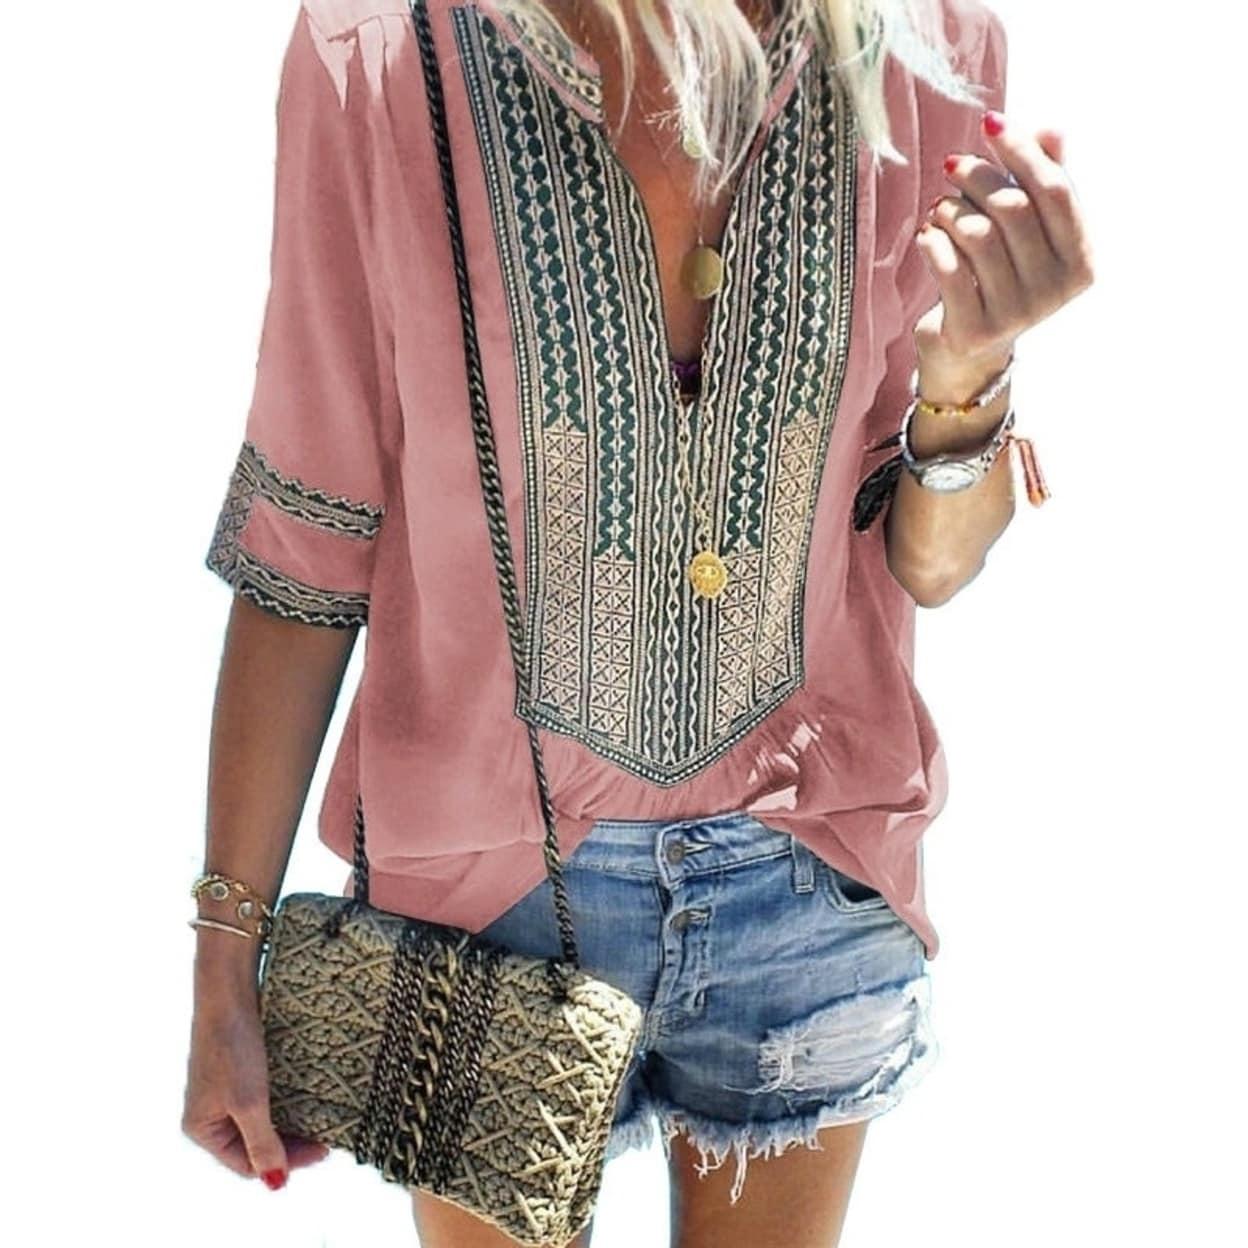 Memela Women Casual Boho Floral Print Pullover Tops V-Neck Long Lantern Sleeve T-Shirt Stylish Drawstring Blouse Tops Shirts